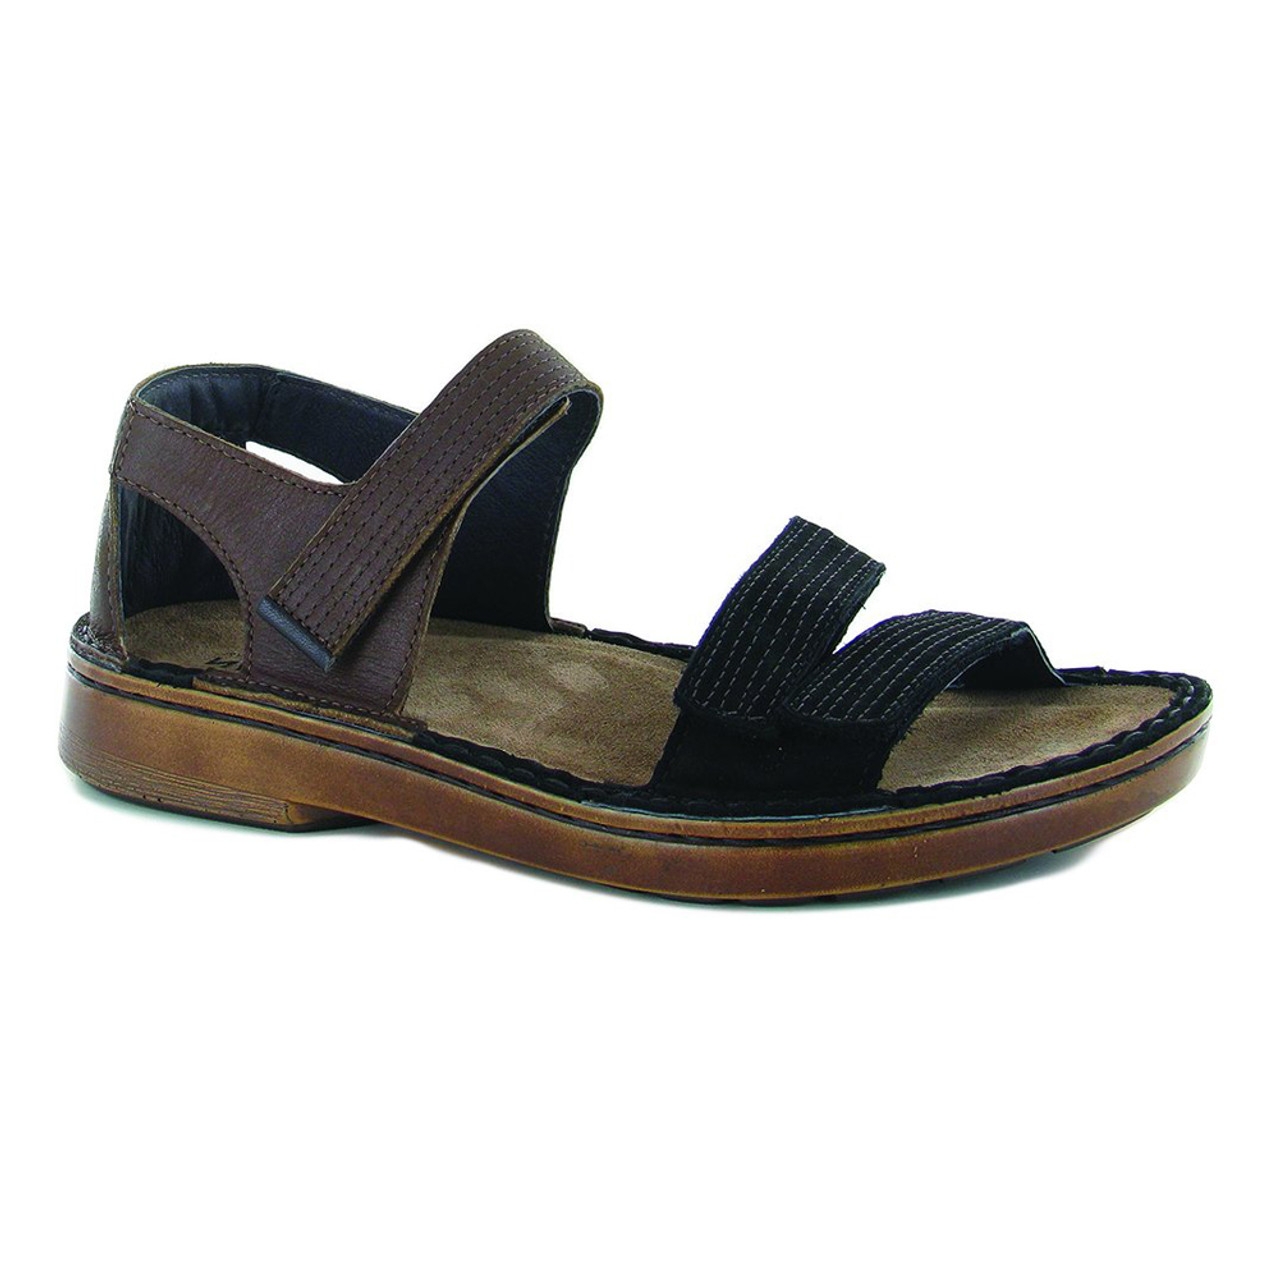 1af3df928ac0 Naot Women s Amarante Sandal Toffee Black - Shop now   Shoolu.com